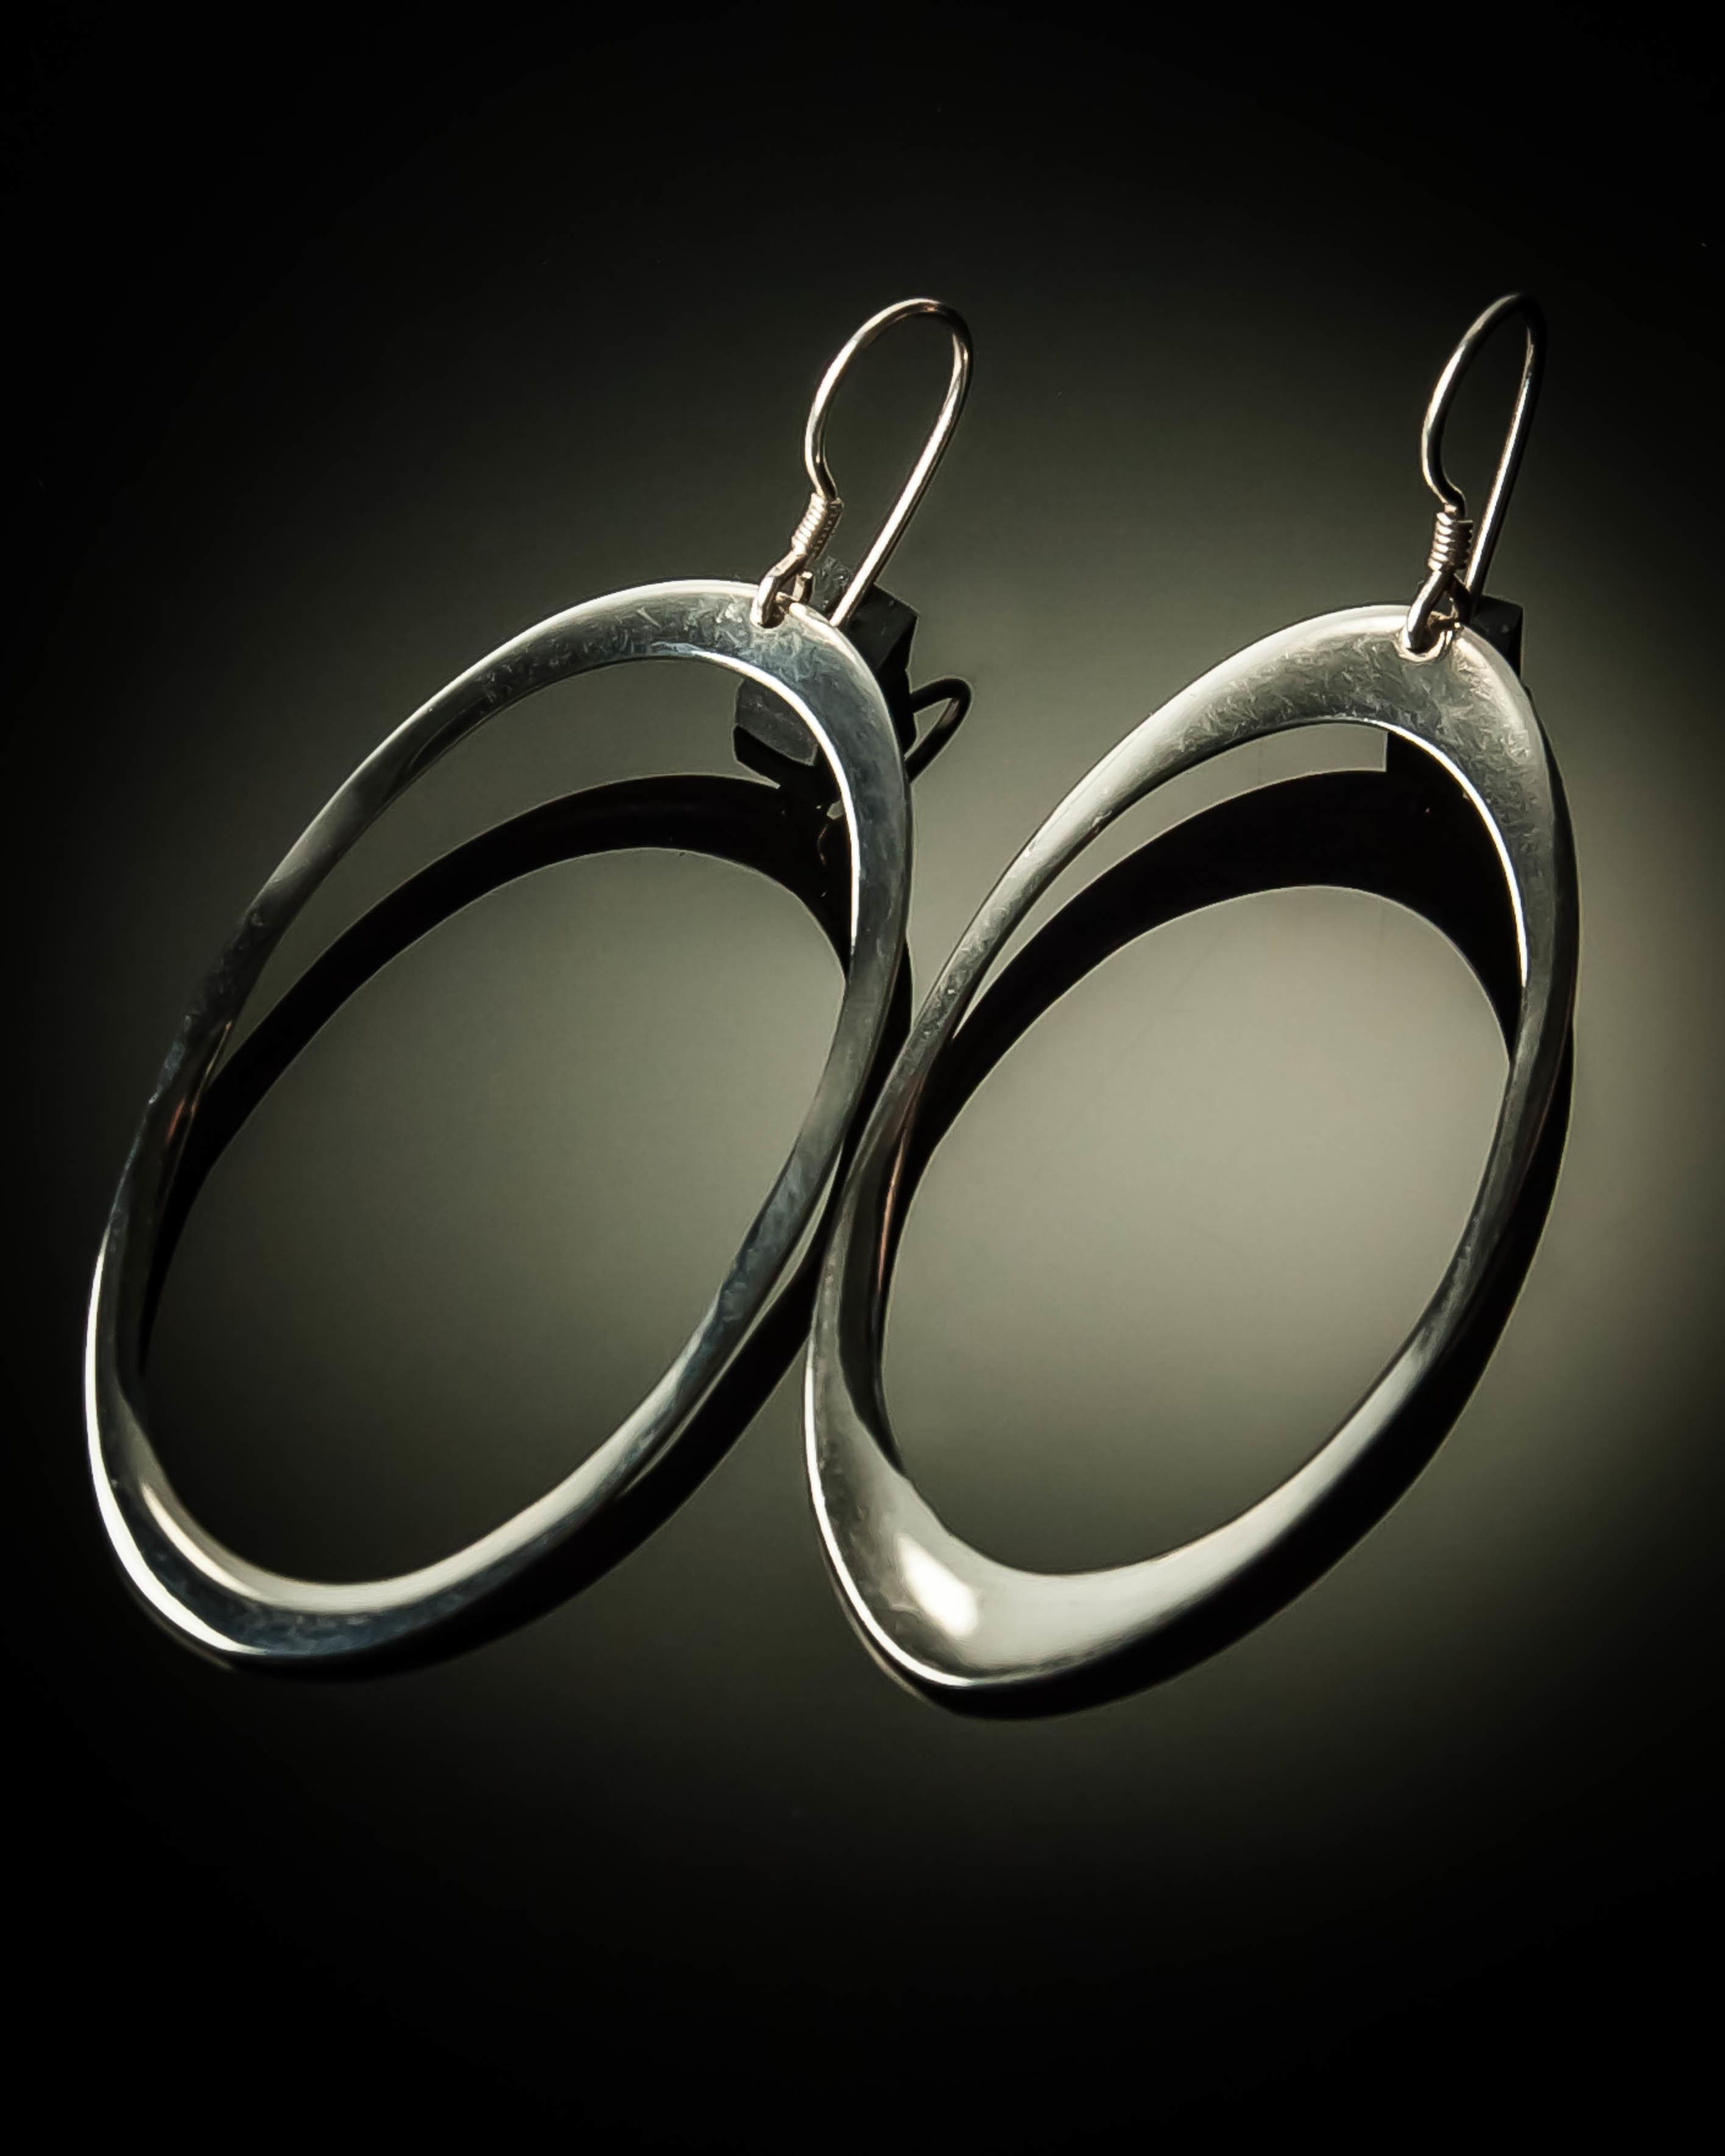 Oval Sterling Silver Earrings- Large ER-09018